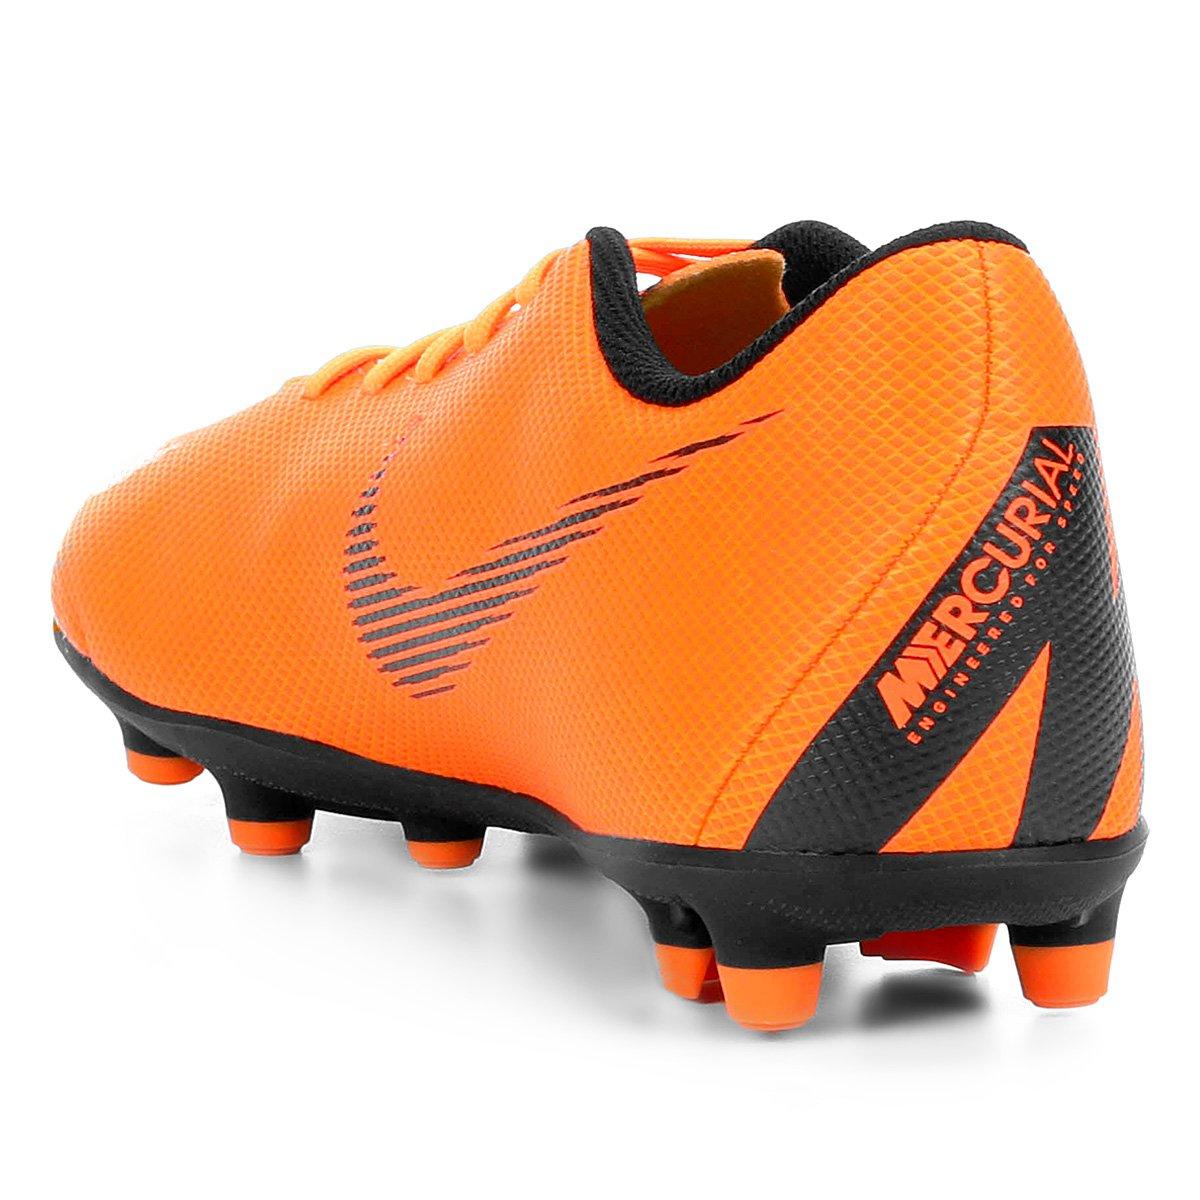 Chuteira Campo Nike Mercurial Vapor 12 Club - Laranja e Preto ... dbe577a91bea8